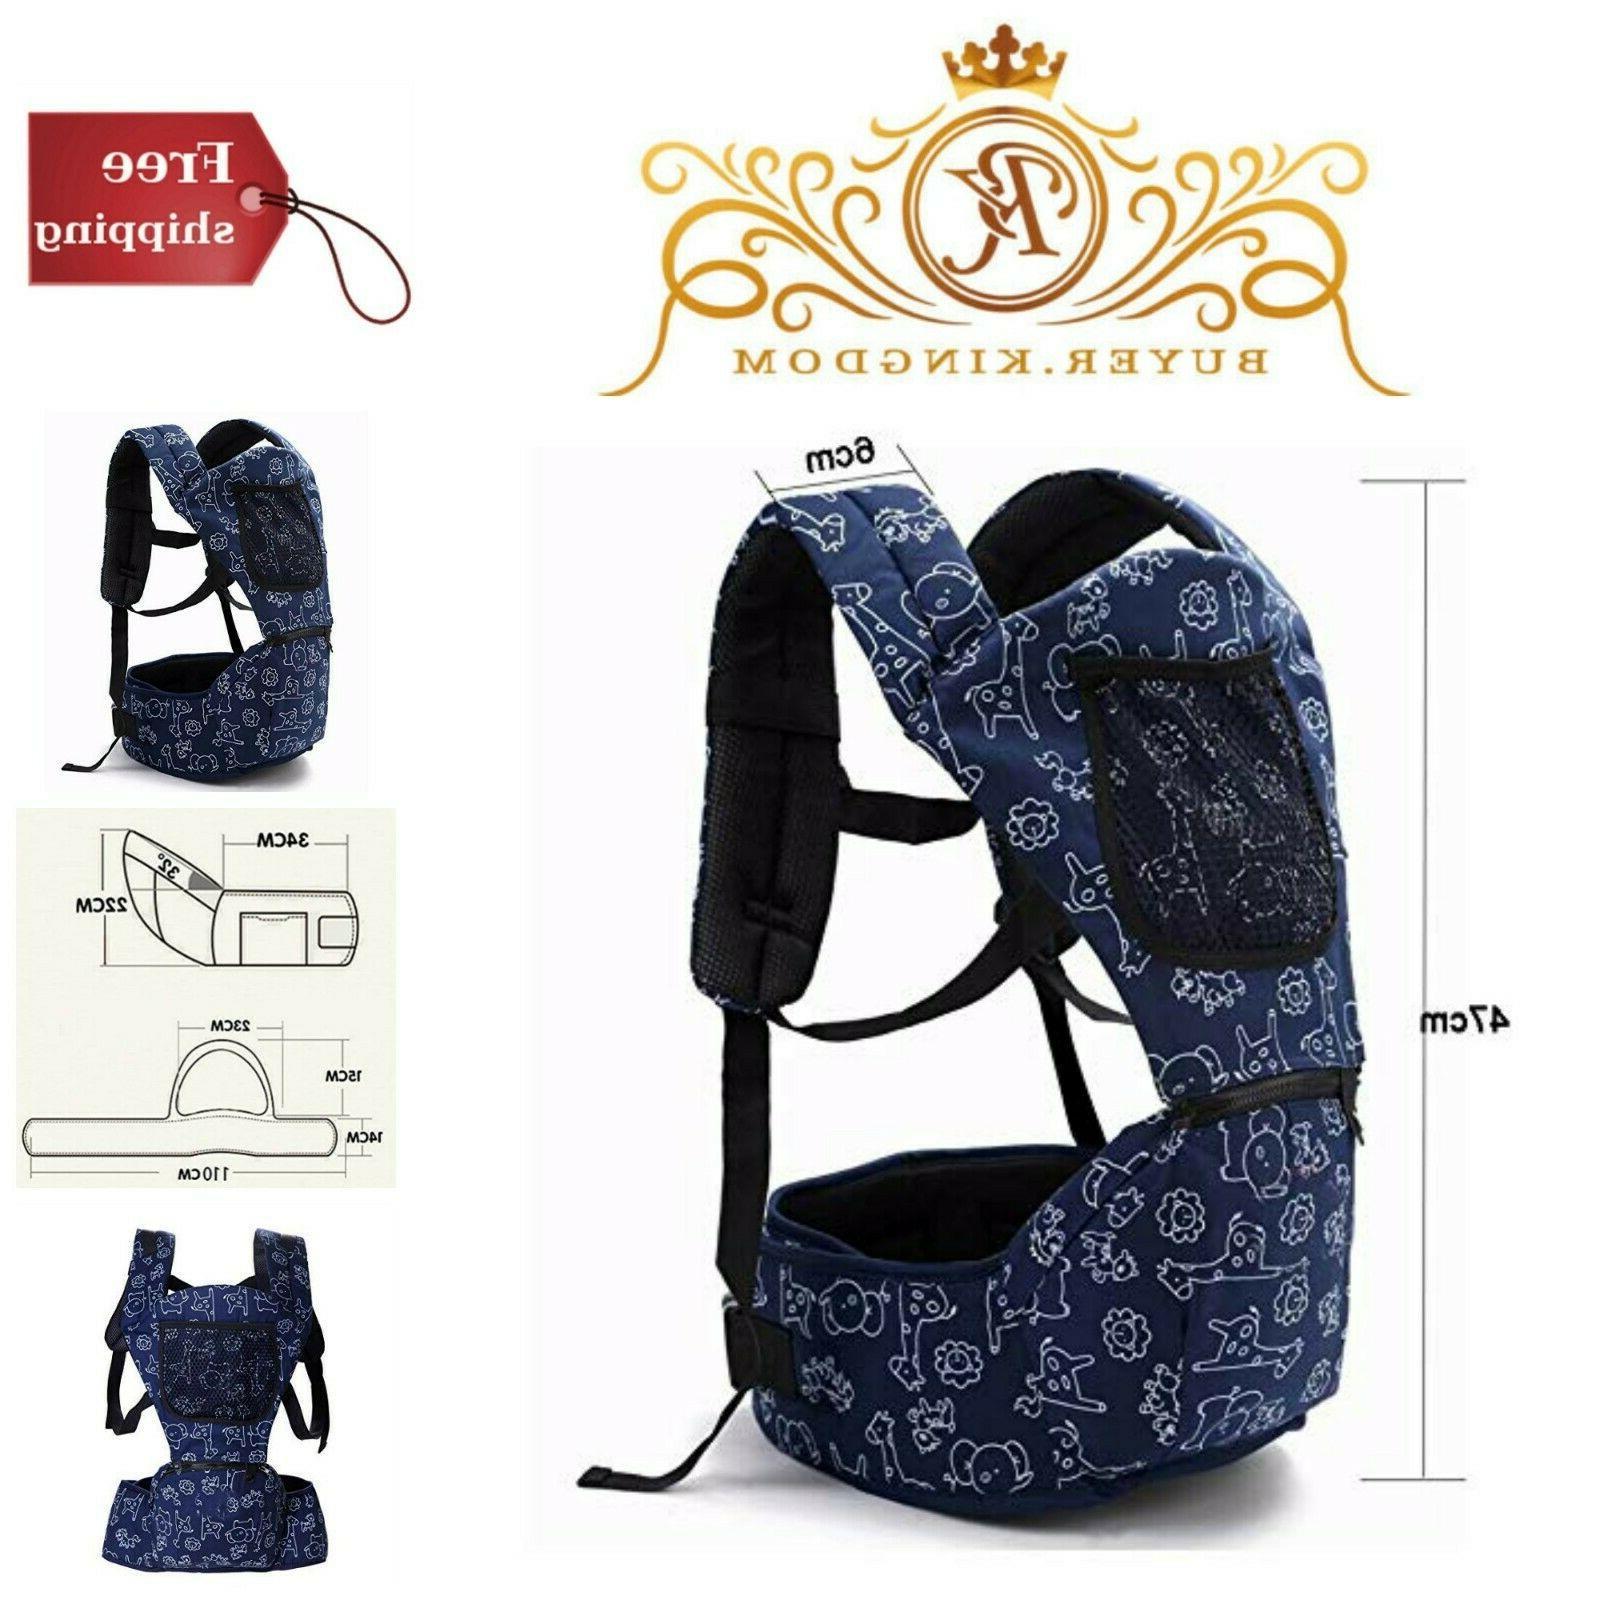 Infant Toddlers Baby Bag Carrier Ergonomic Outdoor Travel Ba